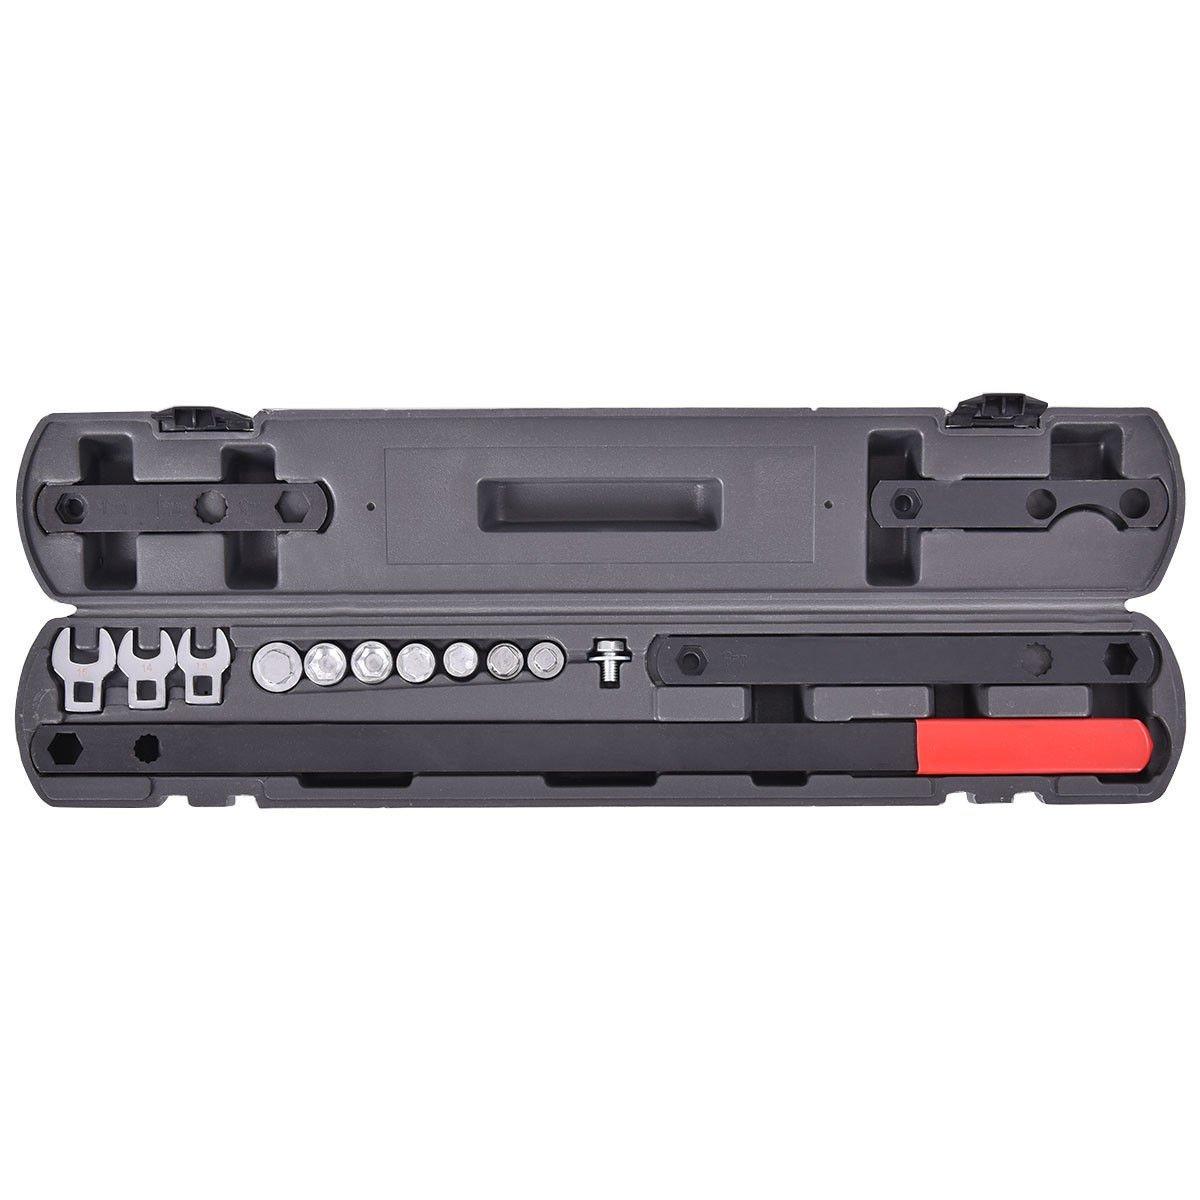 New 16PC Ratcheting Wrench Serpentine Belt Tool Kit Automotive Repair Set Sockets